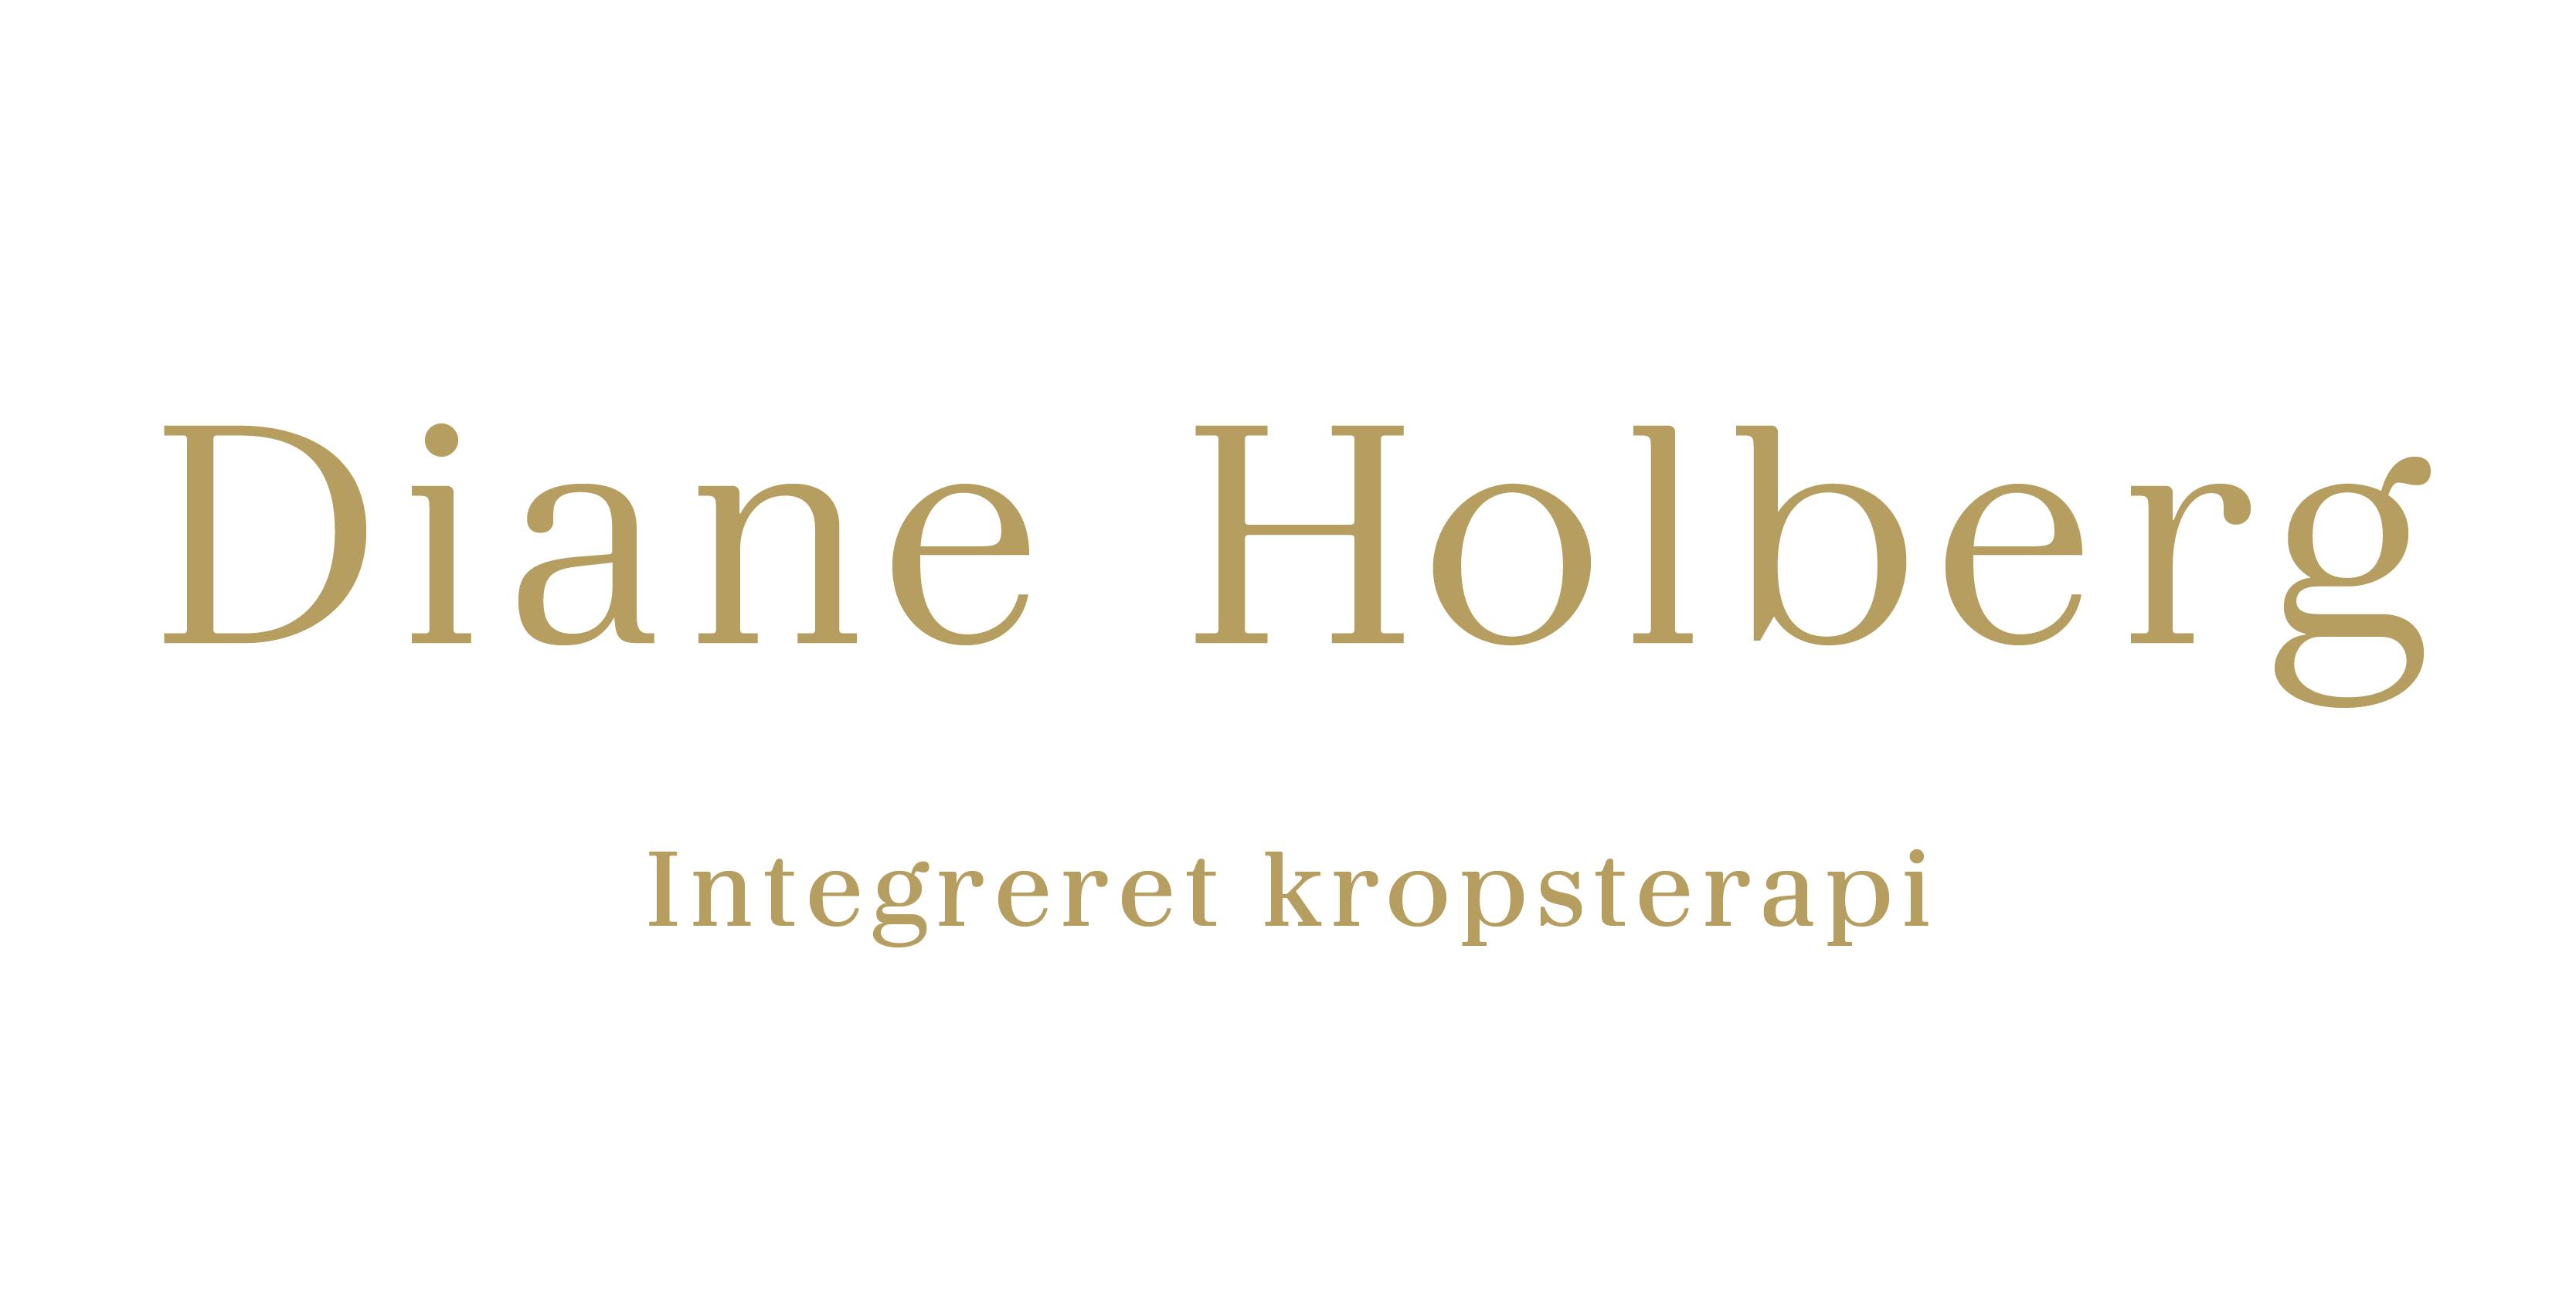 Diane Holberg